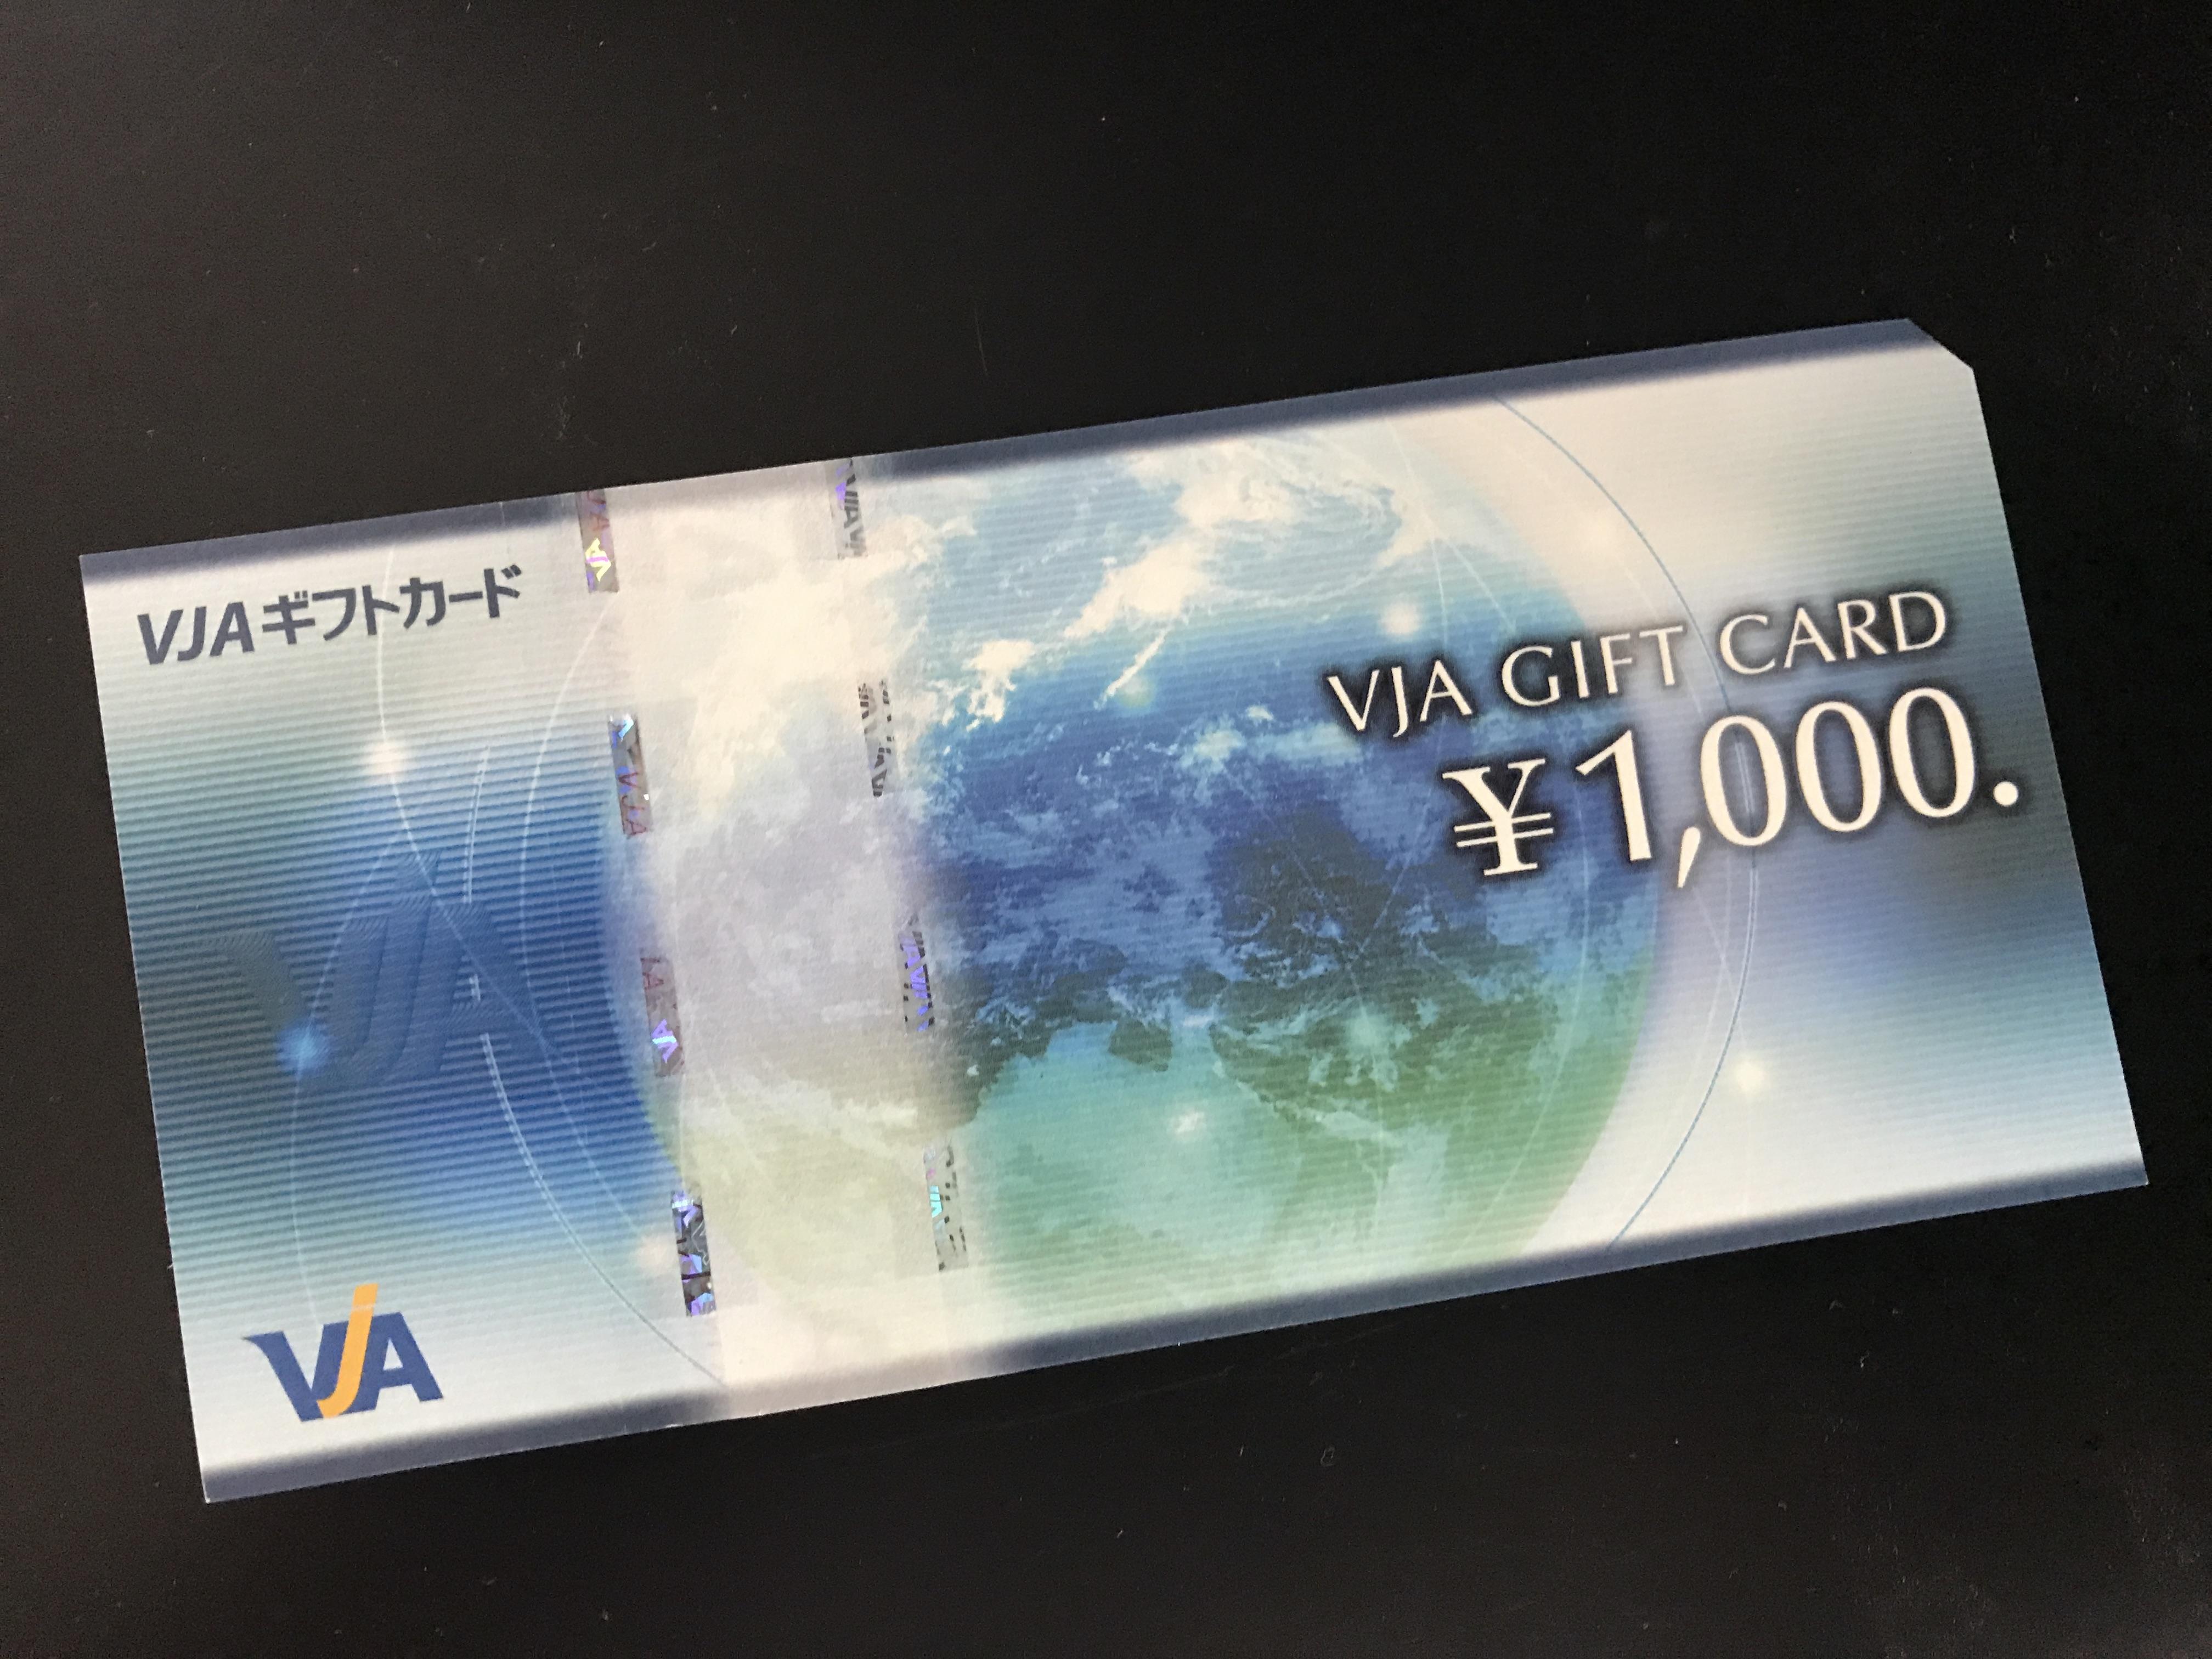 VJA 商品券 ギフトカード